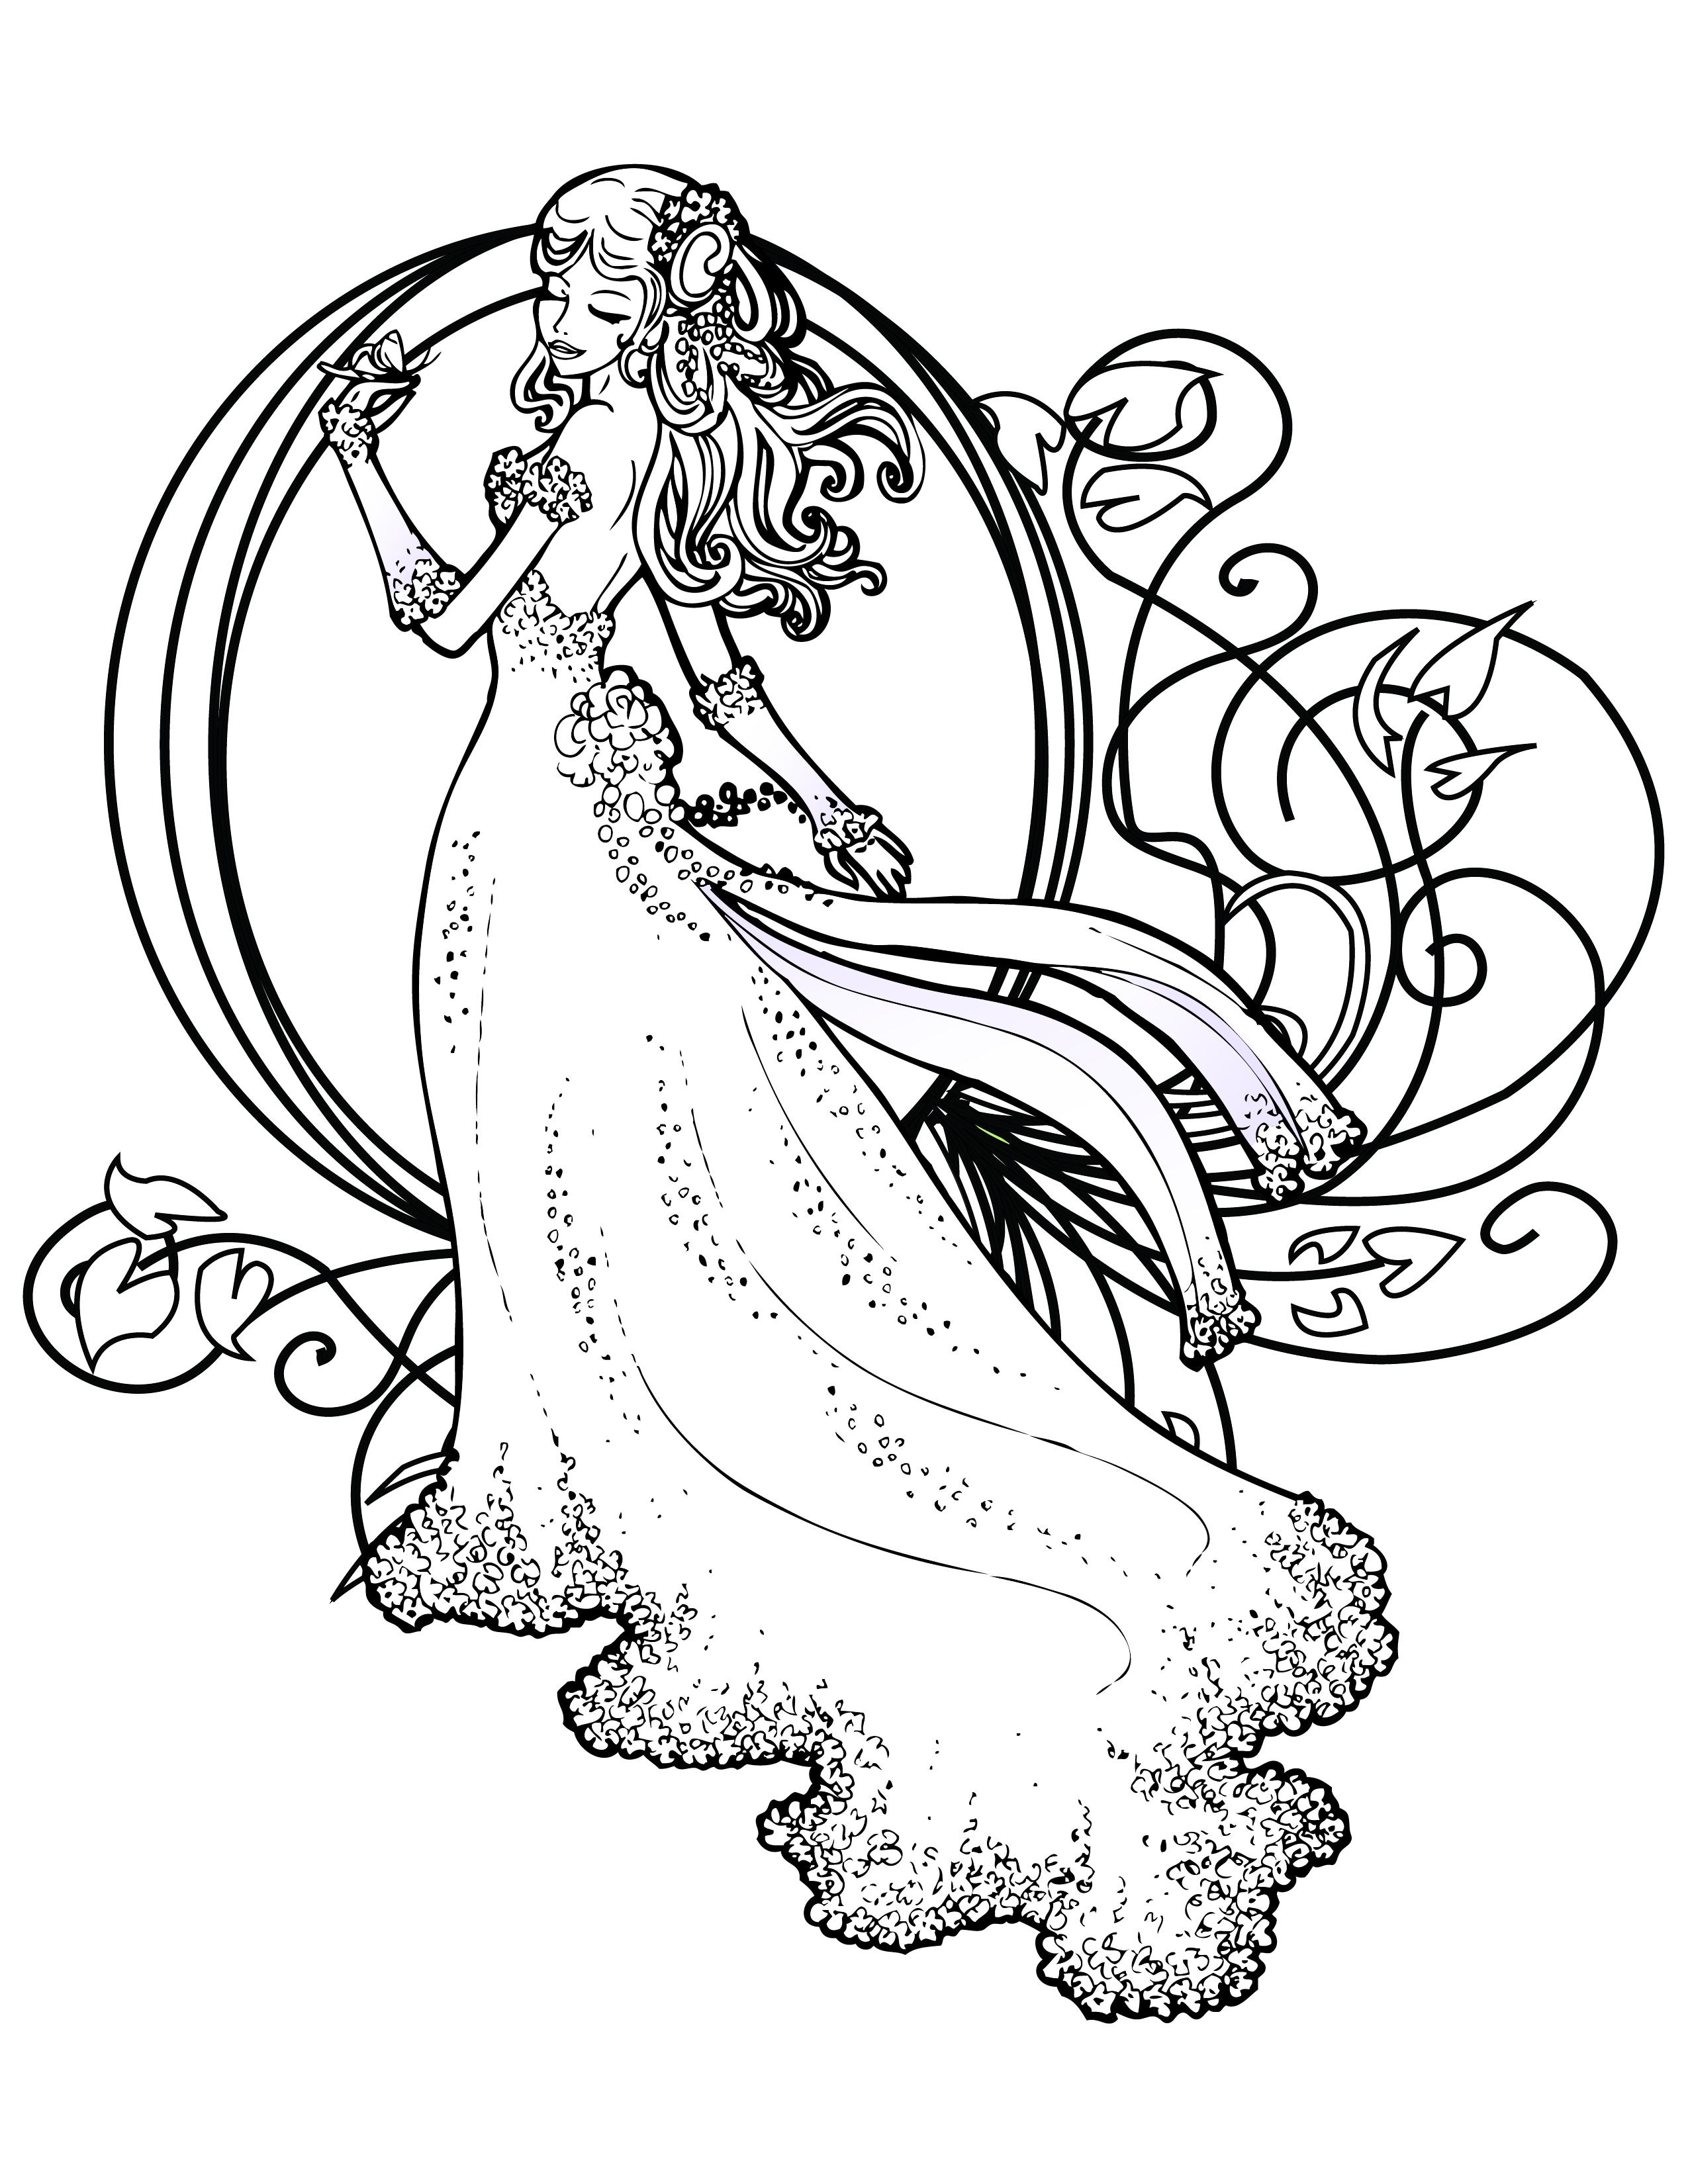 Coloriage De Princesse Disney Gratuit À Imprimer - Artherapie.ca avec Coloriage Mandala Disney À Imprimer Gratuit